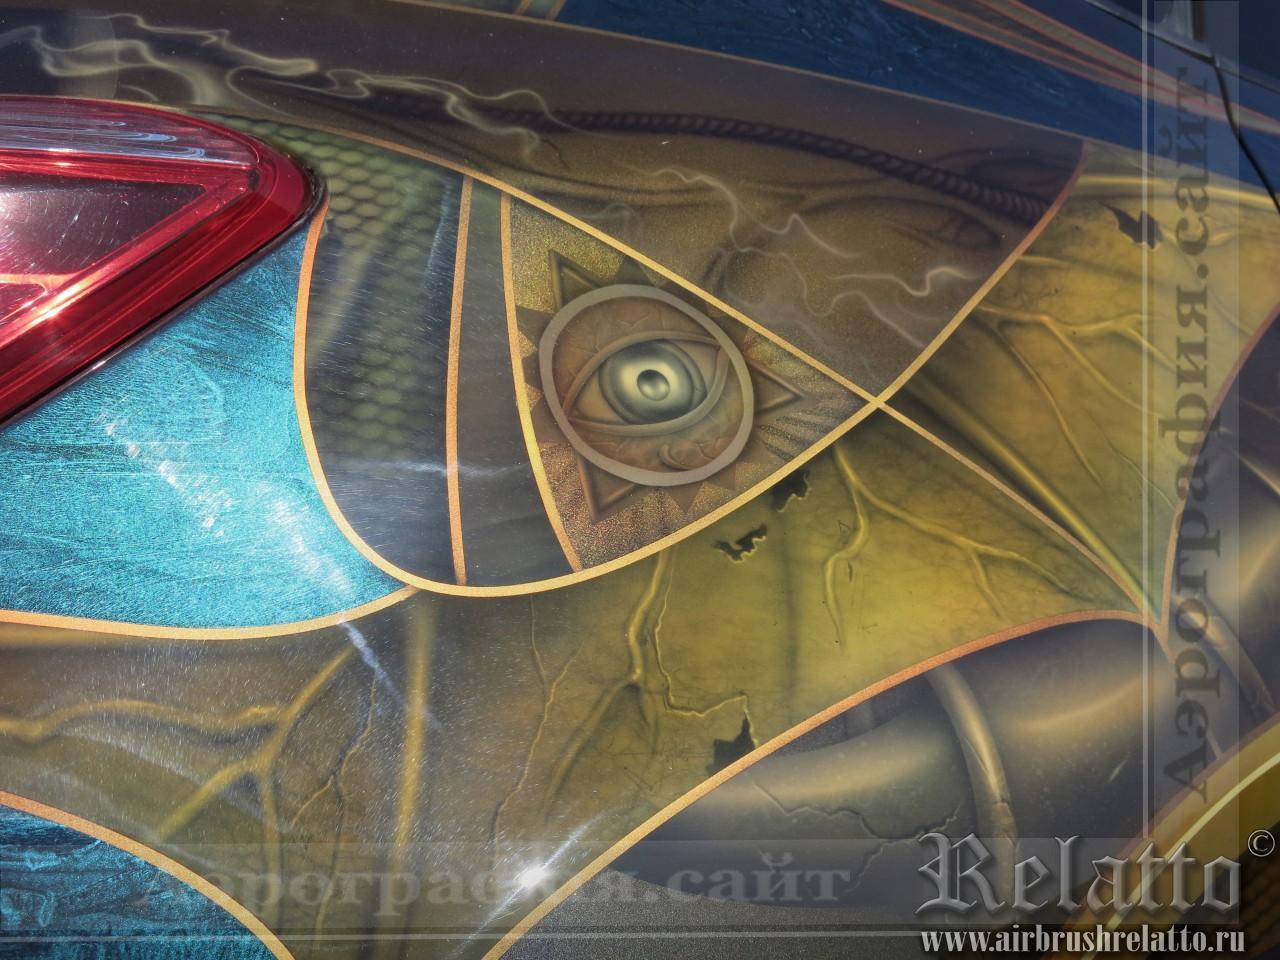 Рисунок на автомобиле Nissan Murano